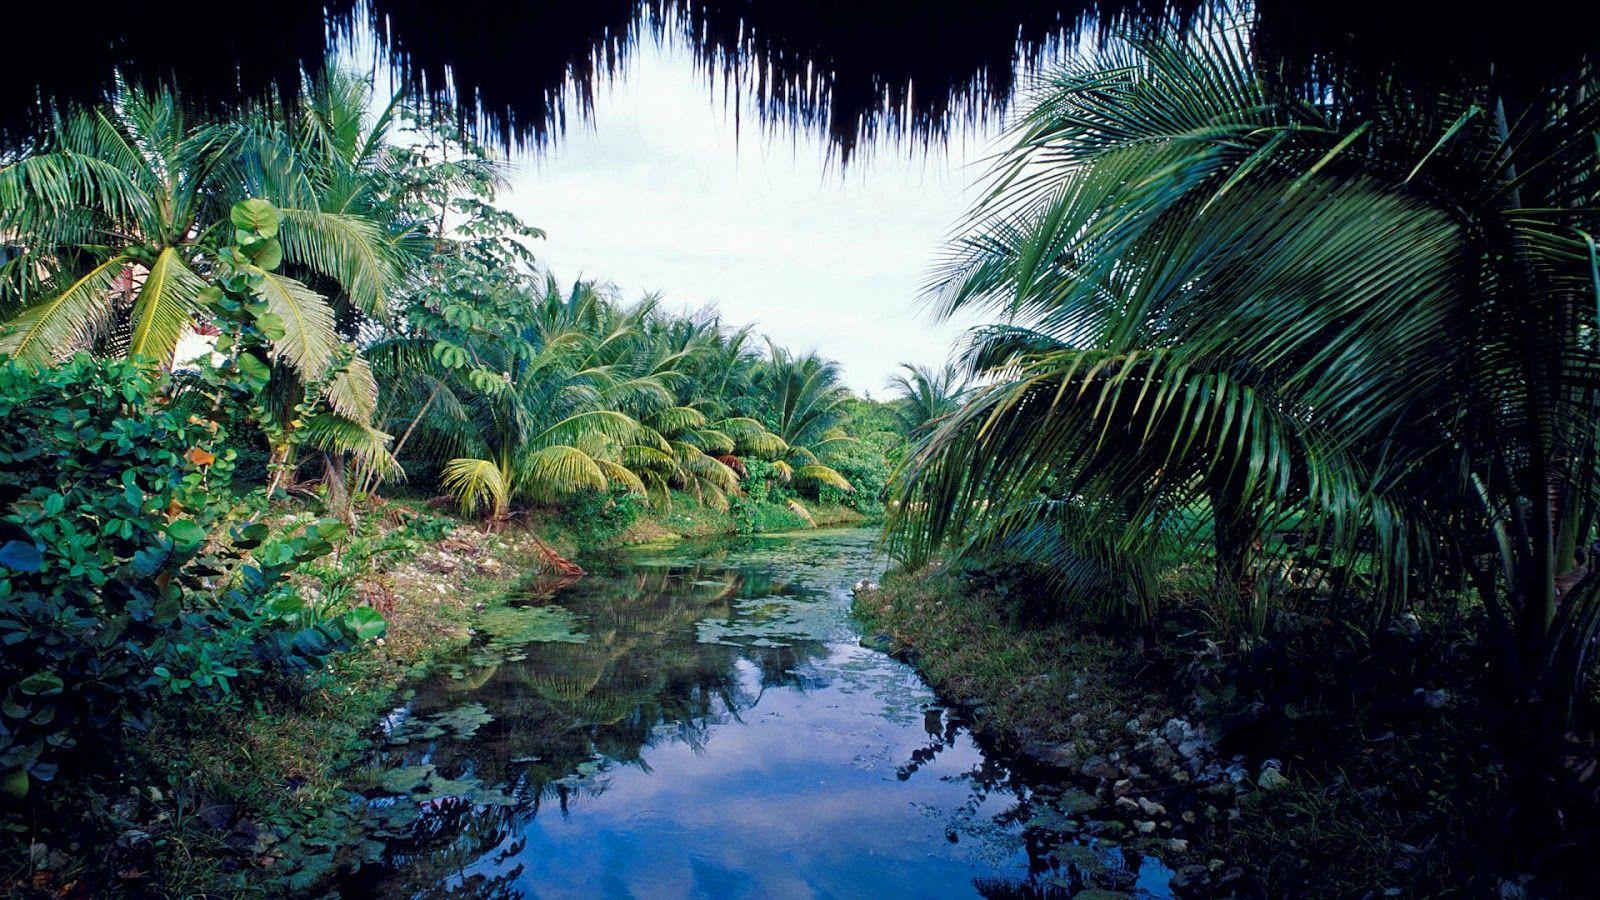 Tapety na pulpit dżungla, rzeka, palmy, amazonka